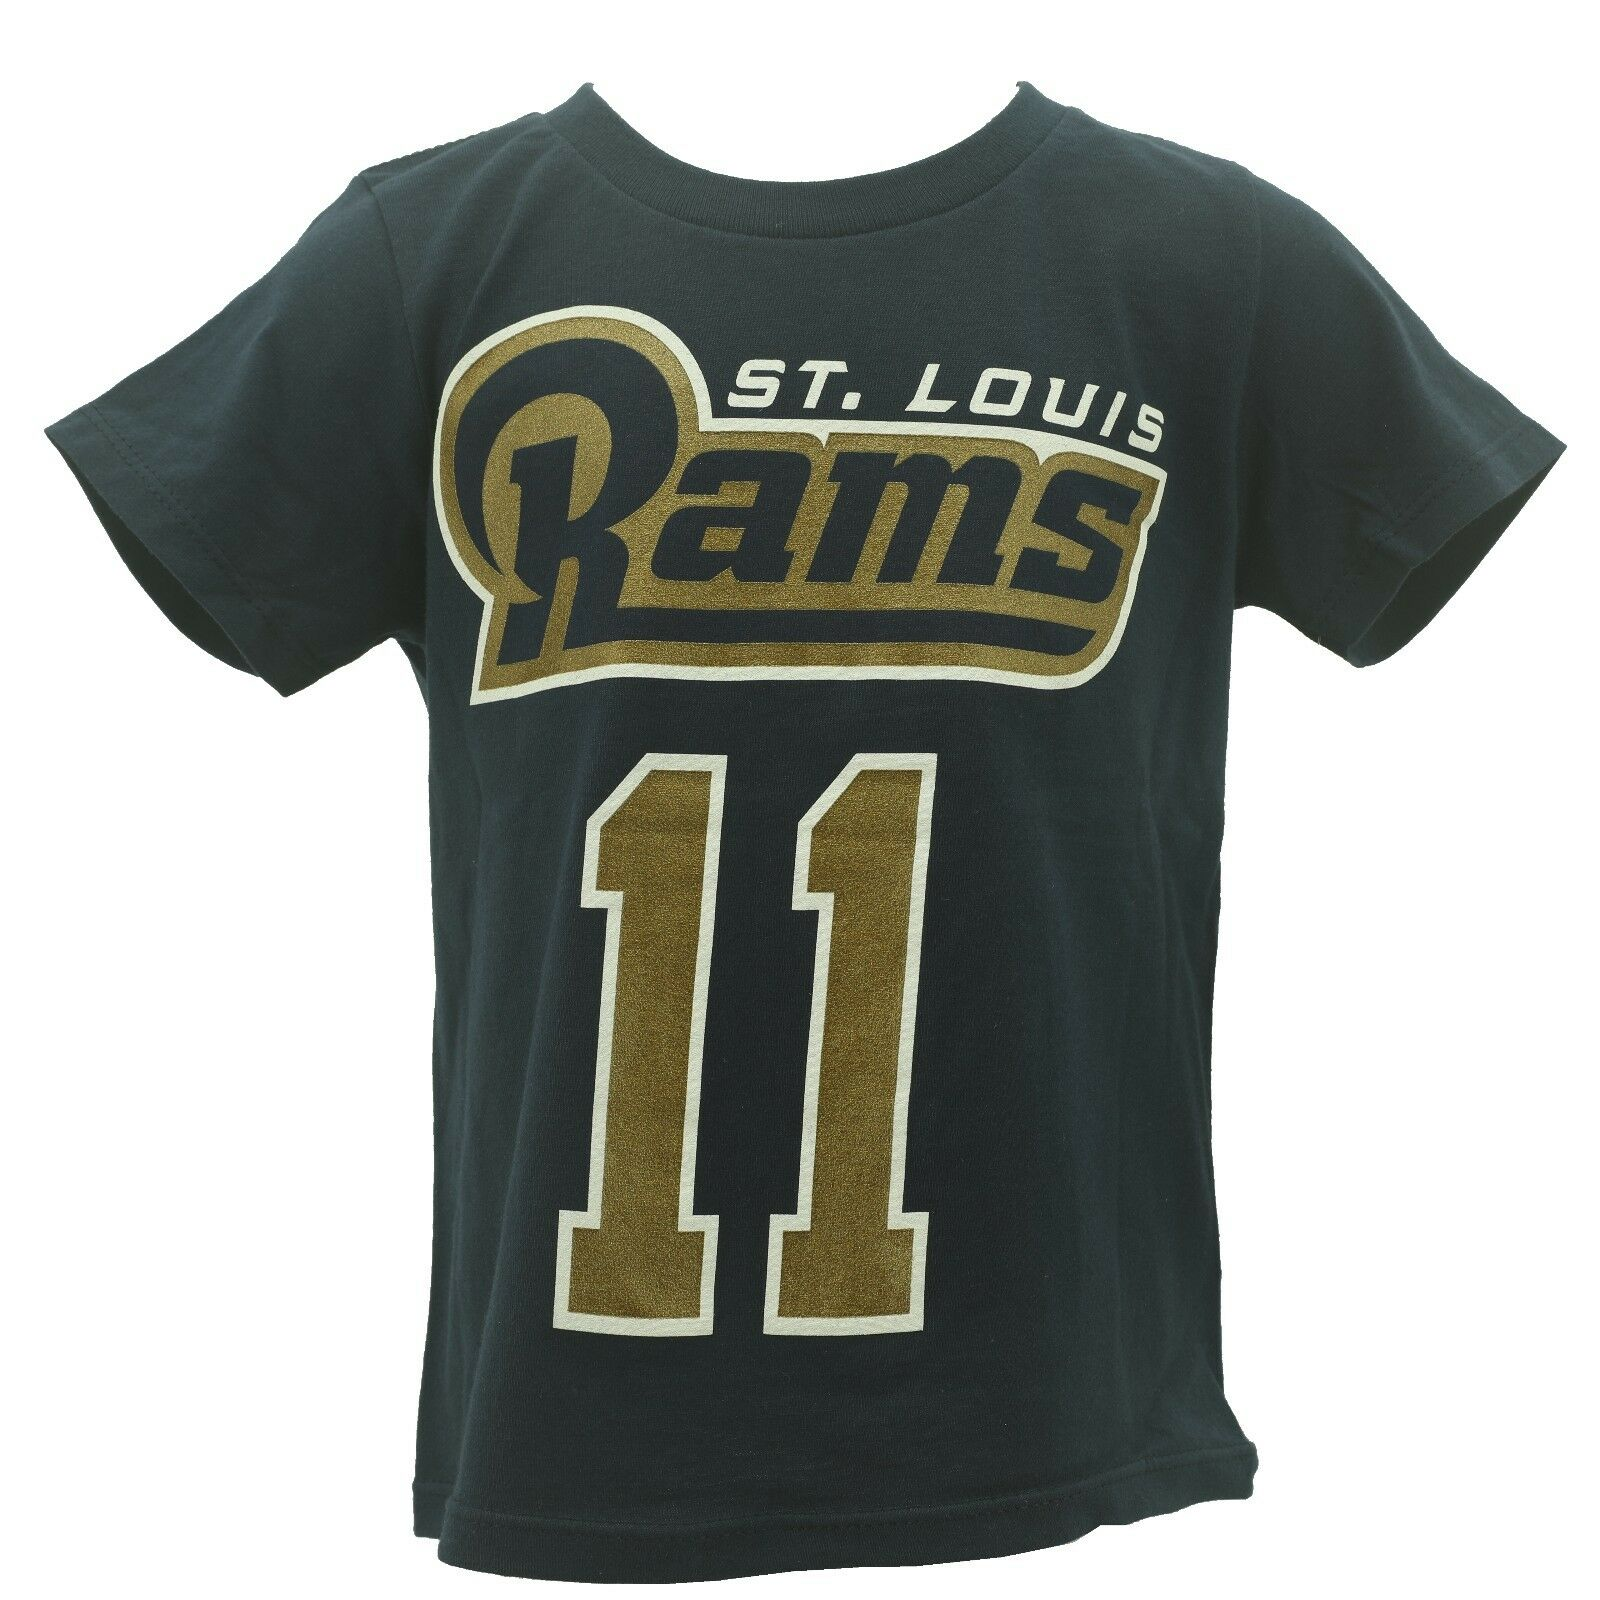 Details about St. Louis Rams Official infant Toddler Size Tavon Austin NFL T -Shirt New W Tags 1cd6b2652